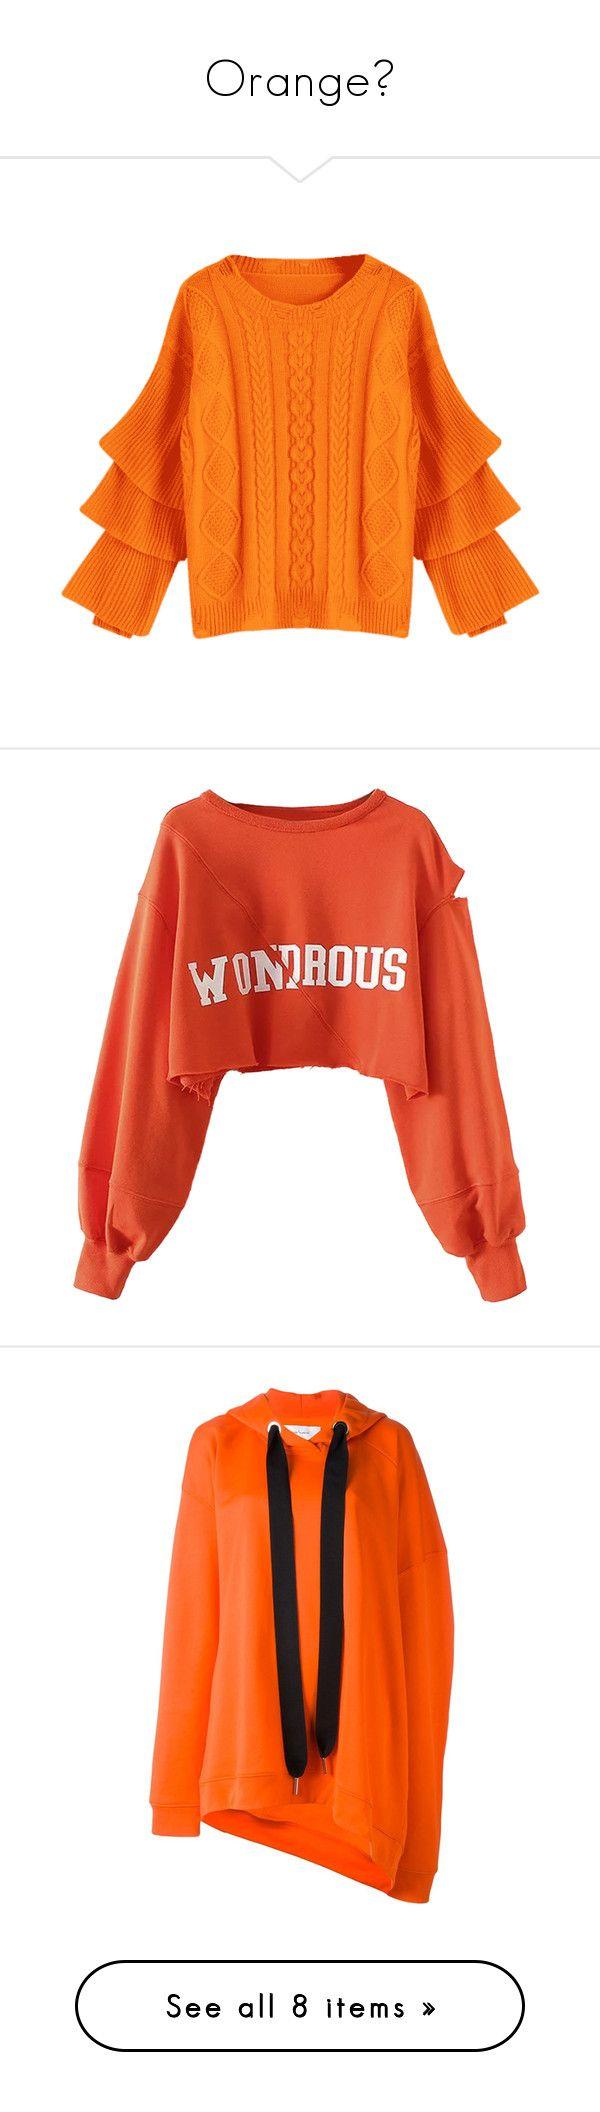 Best 25  Orange sweaters ideas on Pinterest | Orange top outfit ...